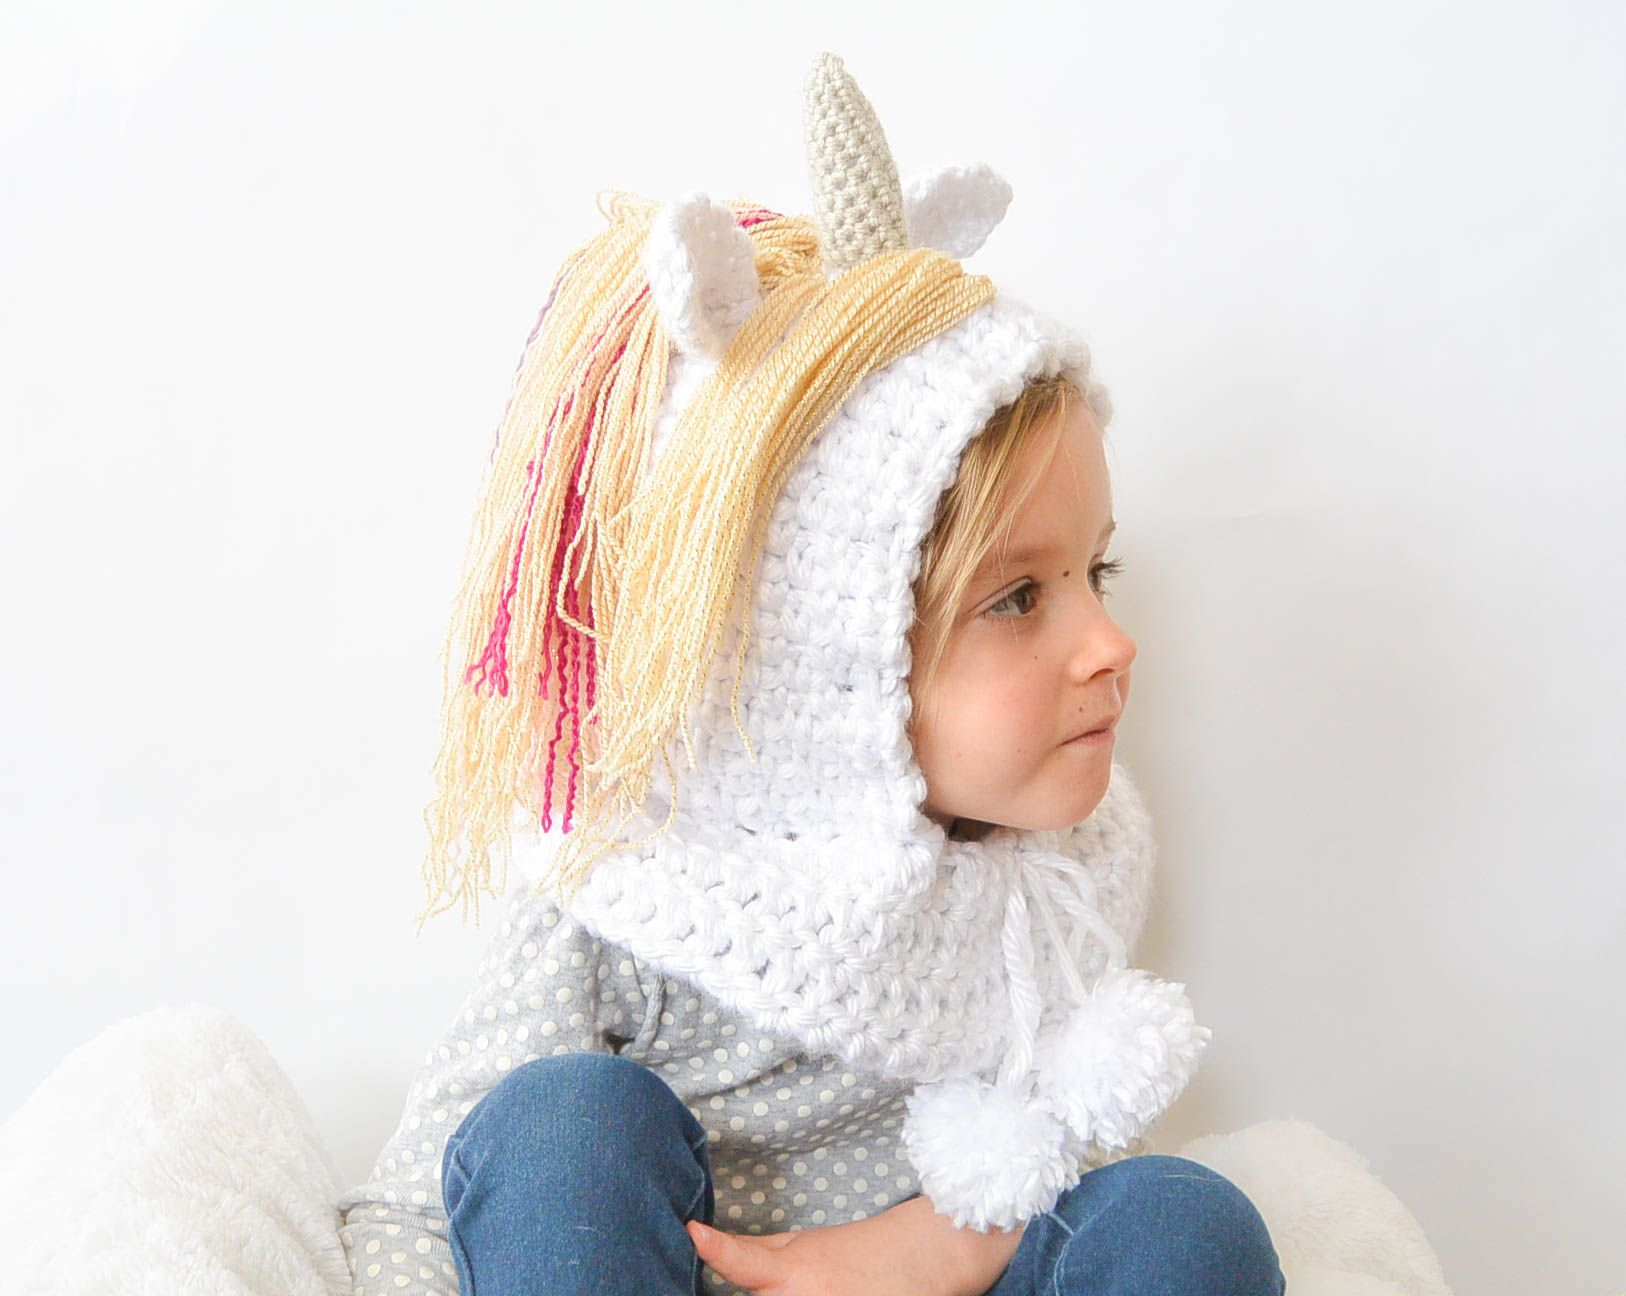 Toddler Magical Unicorn Crochet Hood Pattern | Things I want to make ...